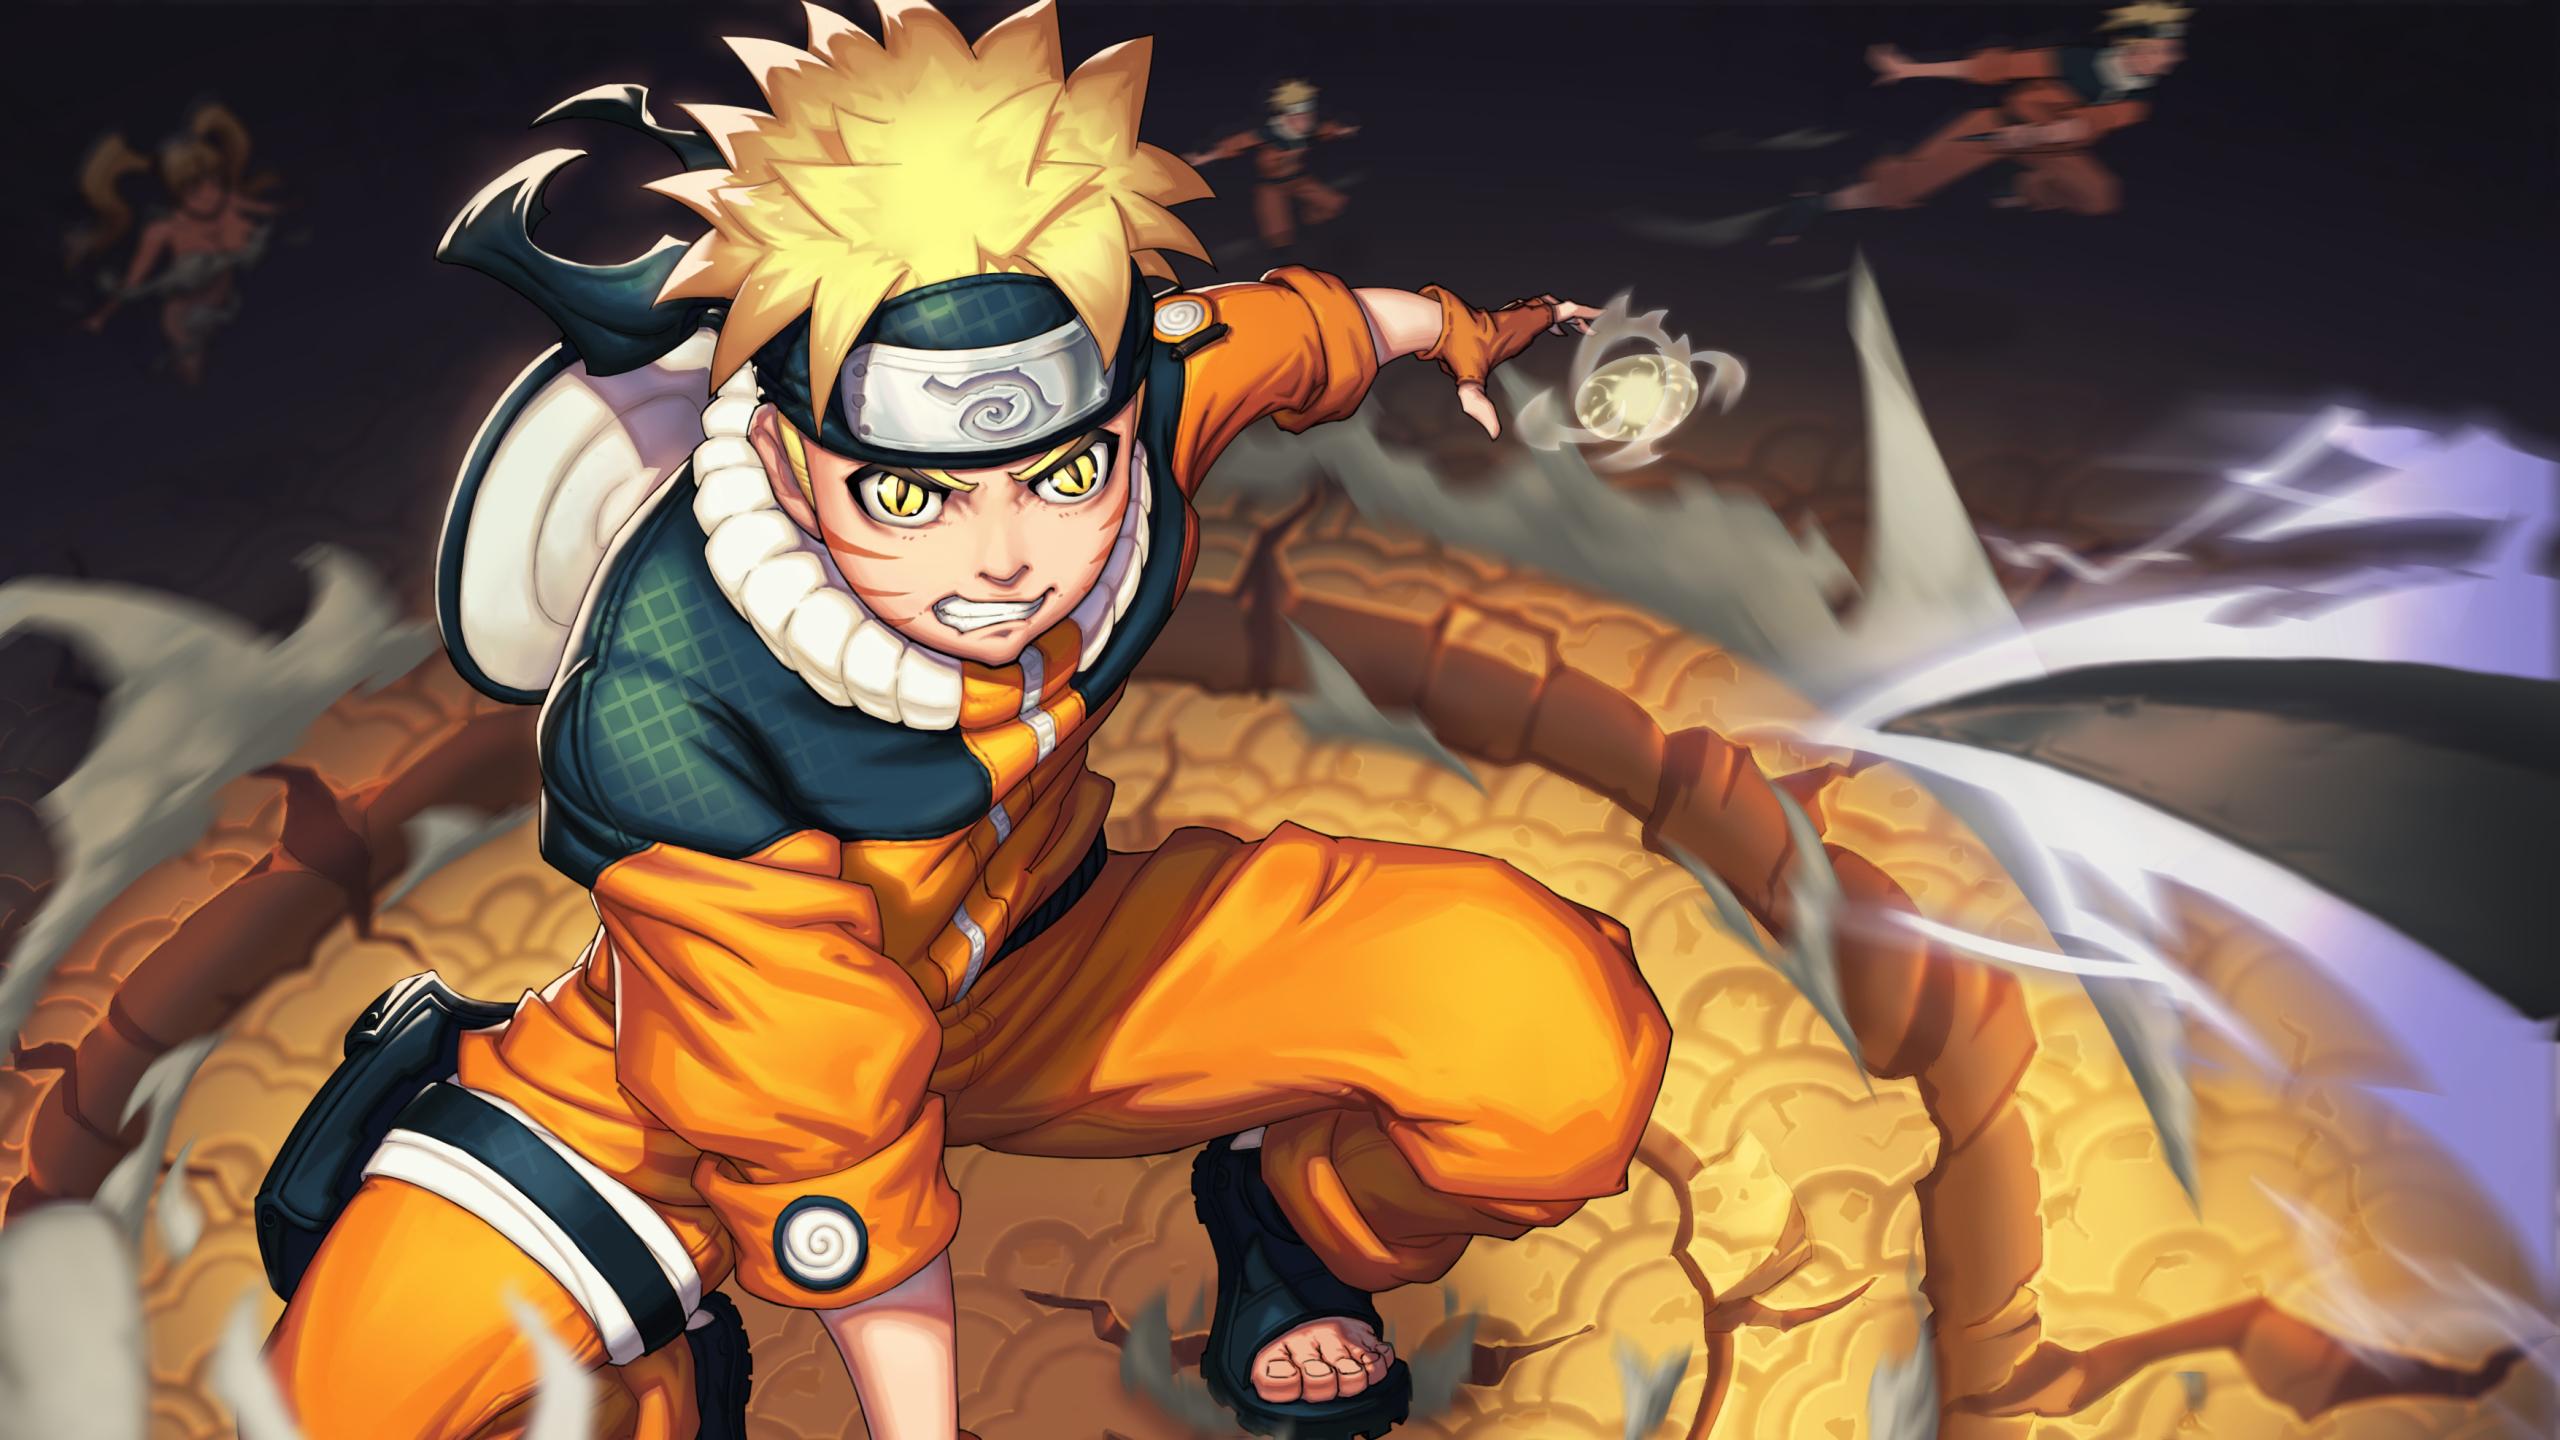 2560x1440 Naruto Uzumaki 4K Art 1440P Resolution Wallpaper ...